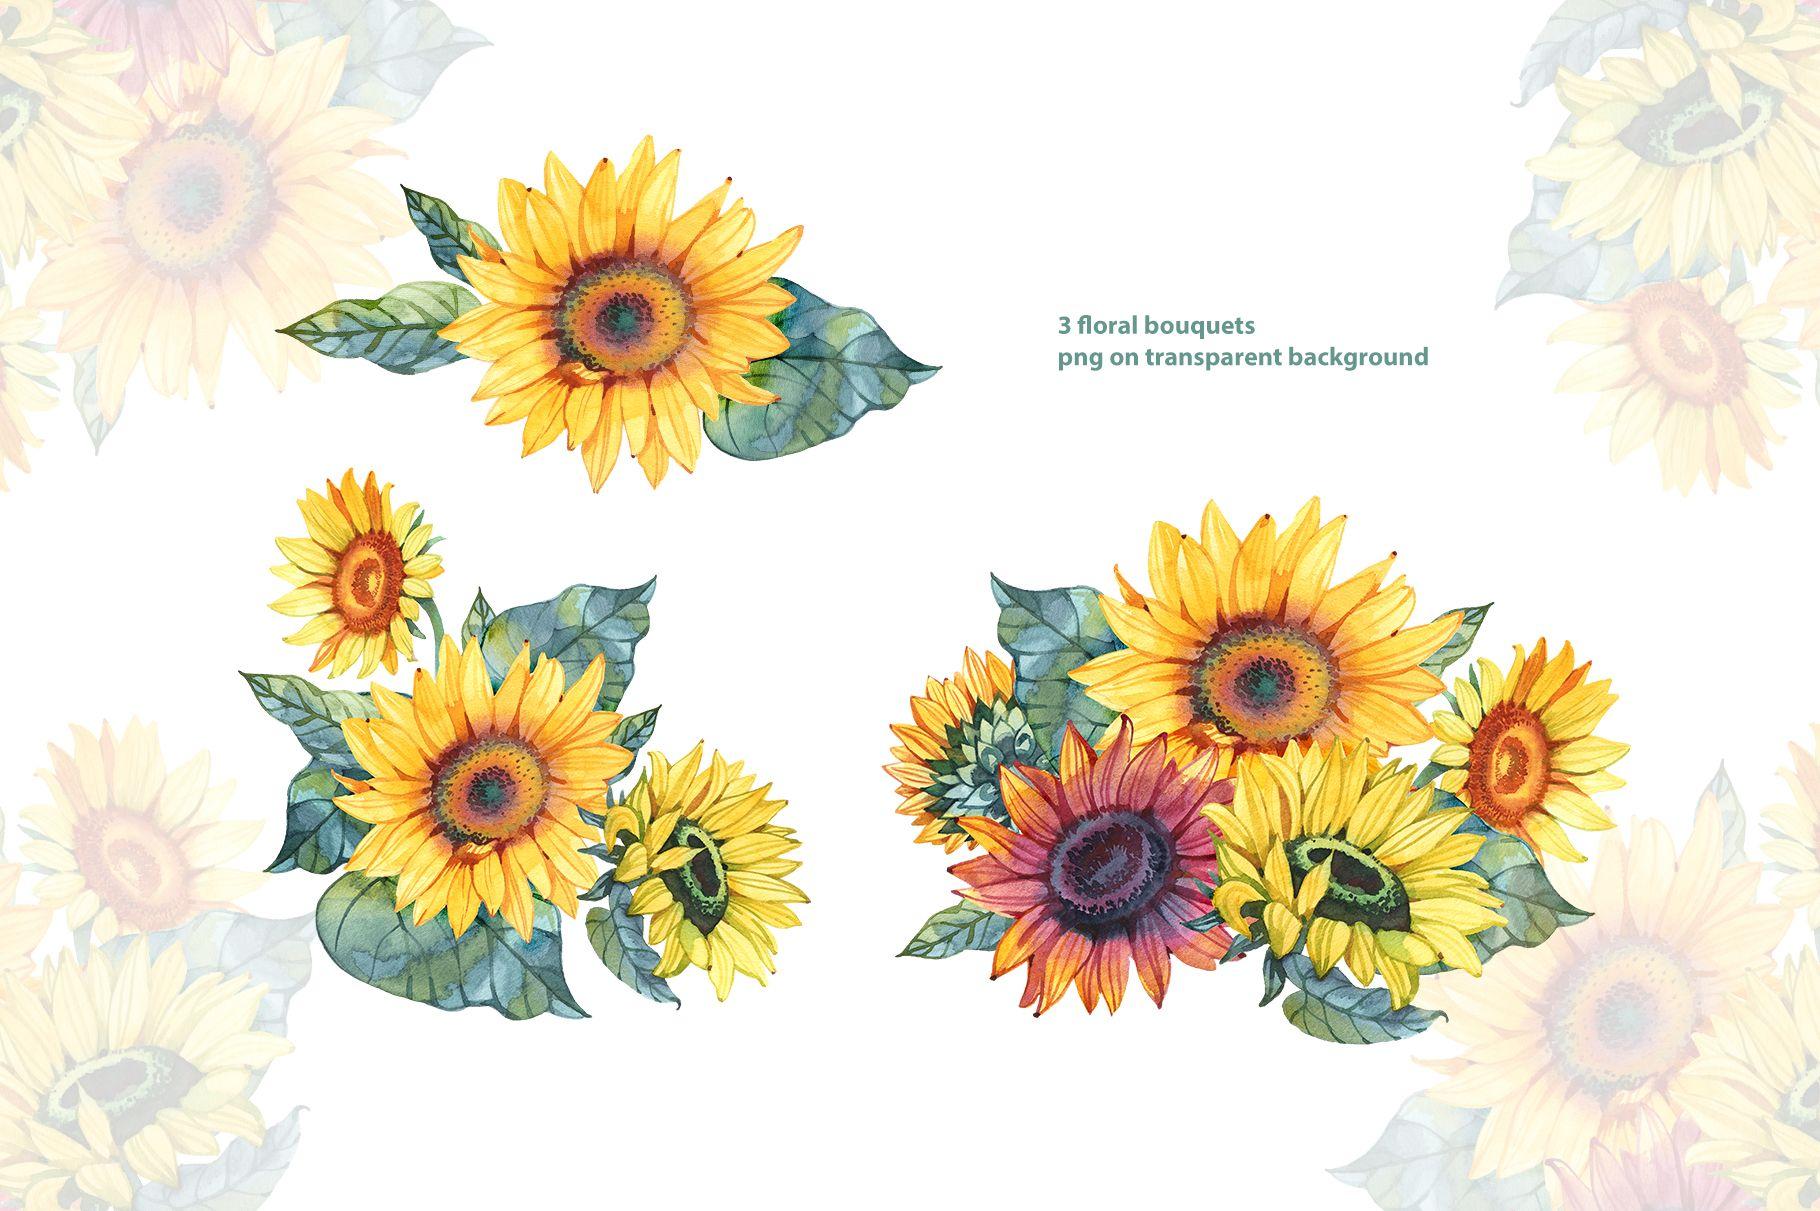 Watercolor Sunflowers Png Cliparts Clip Art Sunflower Etsy Watercolor Sunflower Sunflower Png Clip Art